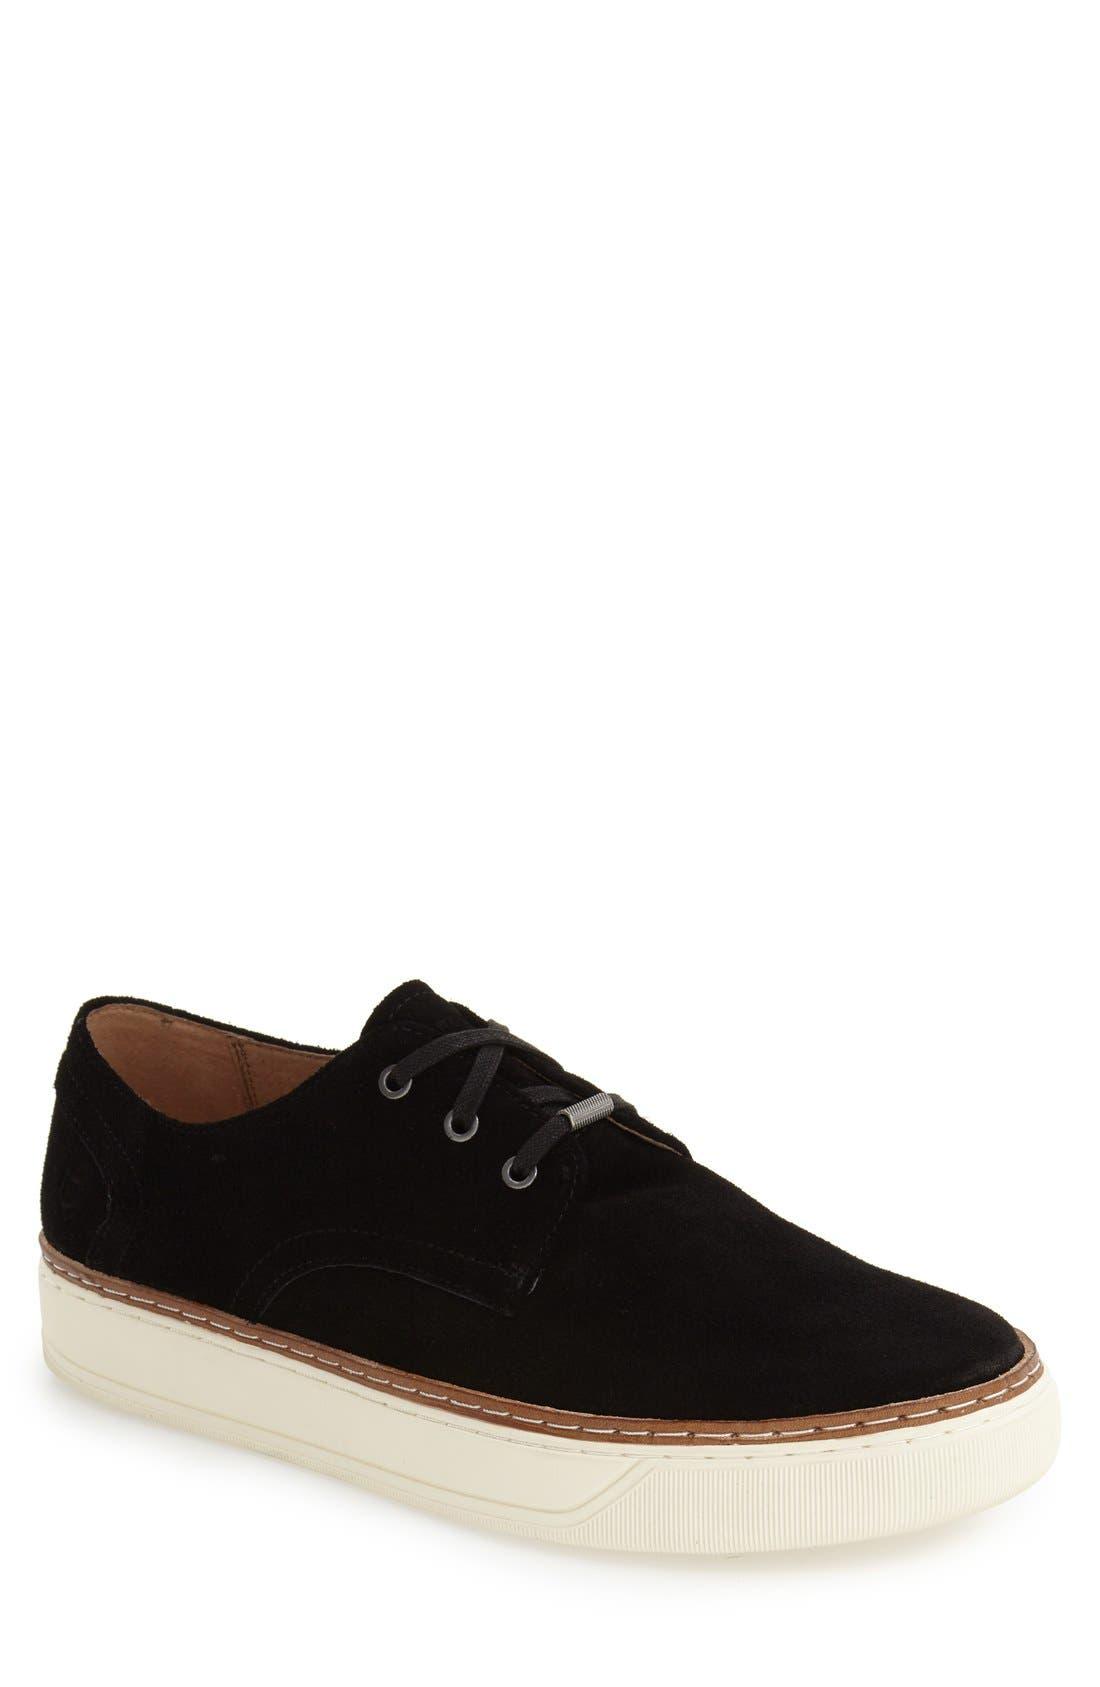 'Edson' Sneaker,                             Main thumbnail 1, color,                             008